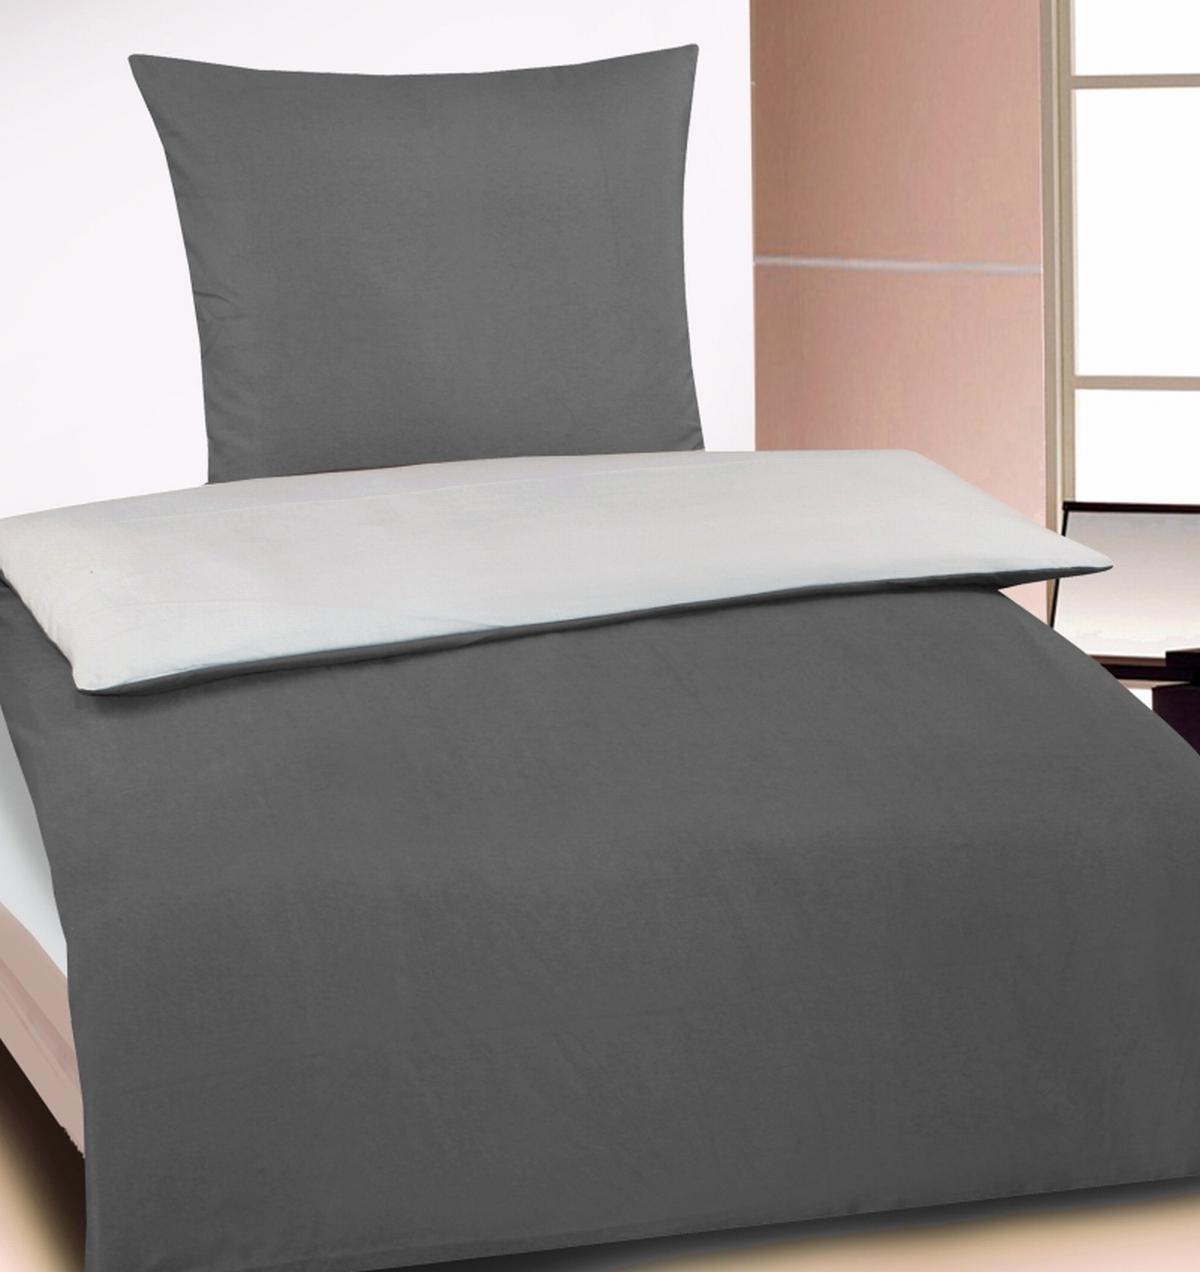 wende bettw sche 155x220 80x80 cm bergr e grau. Black Bedroom Furniture Sets. Home Design Ideas